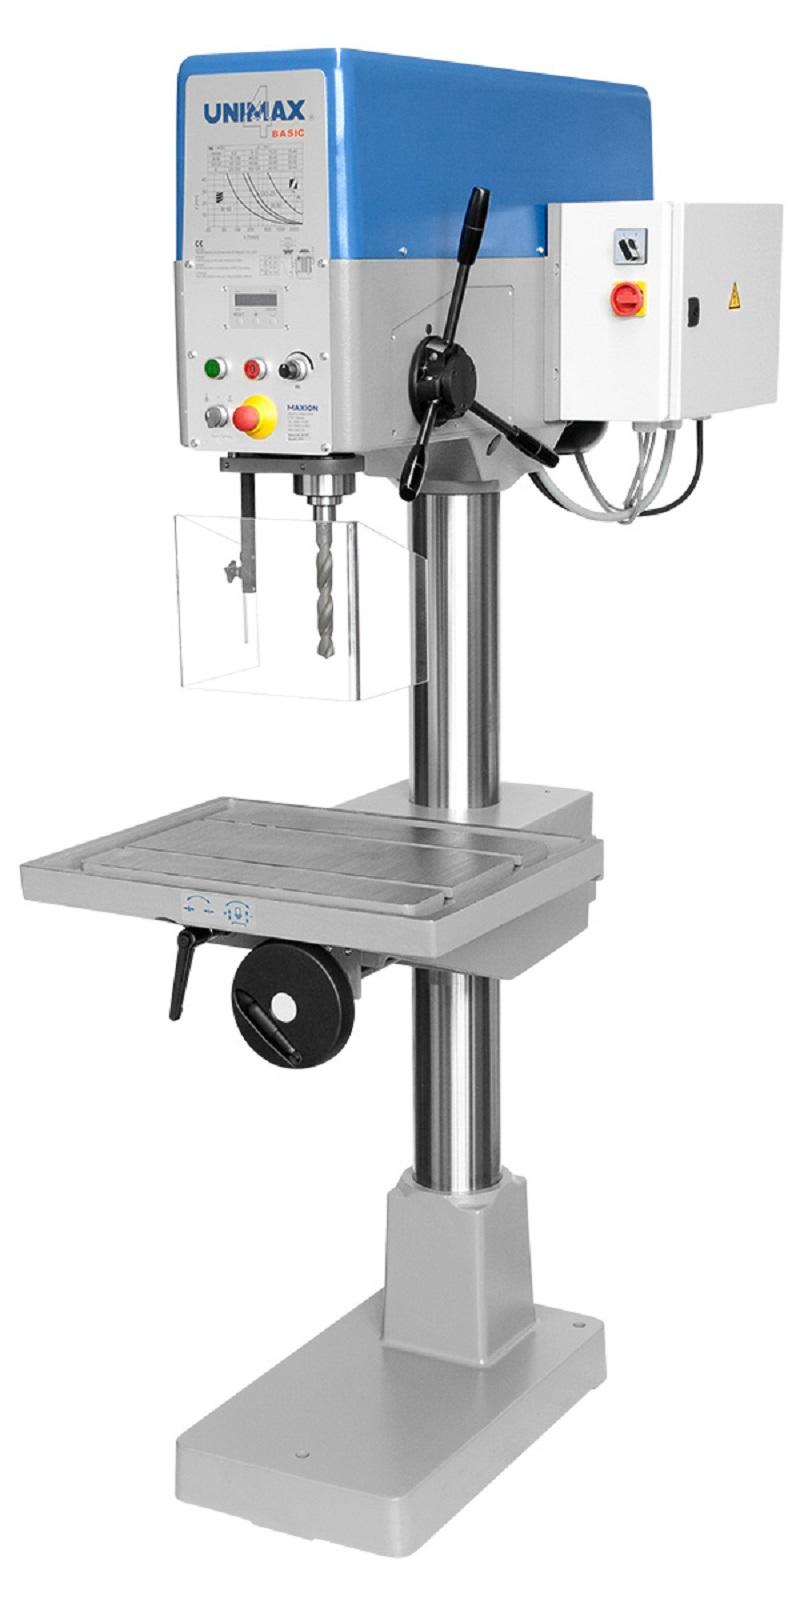 MAXION Säulenbohrmaschine UNIMAX 4 Basic Plus